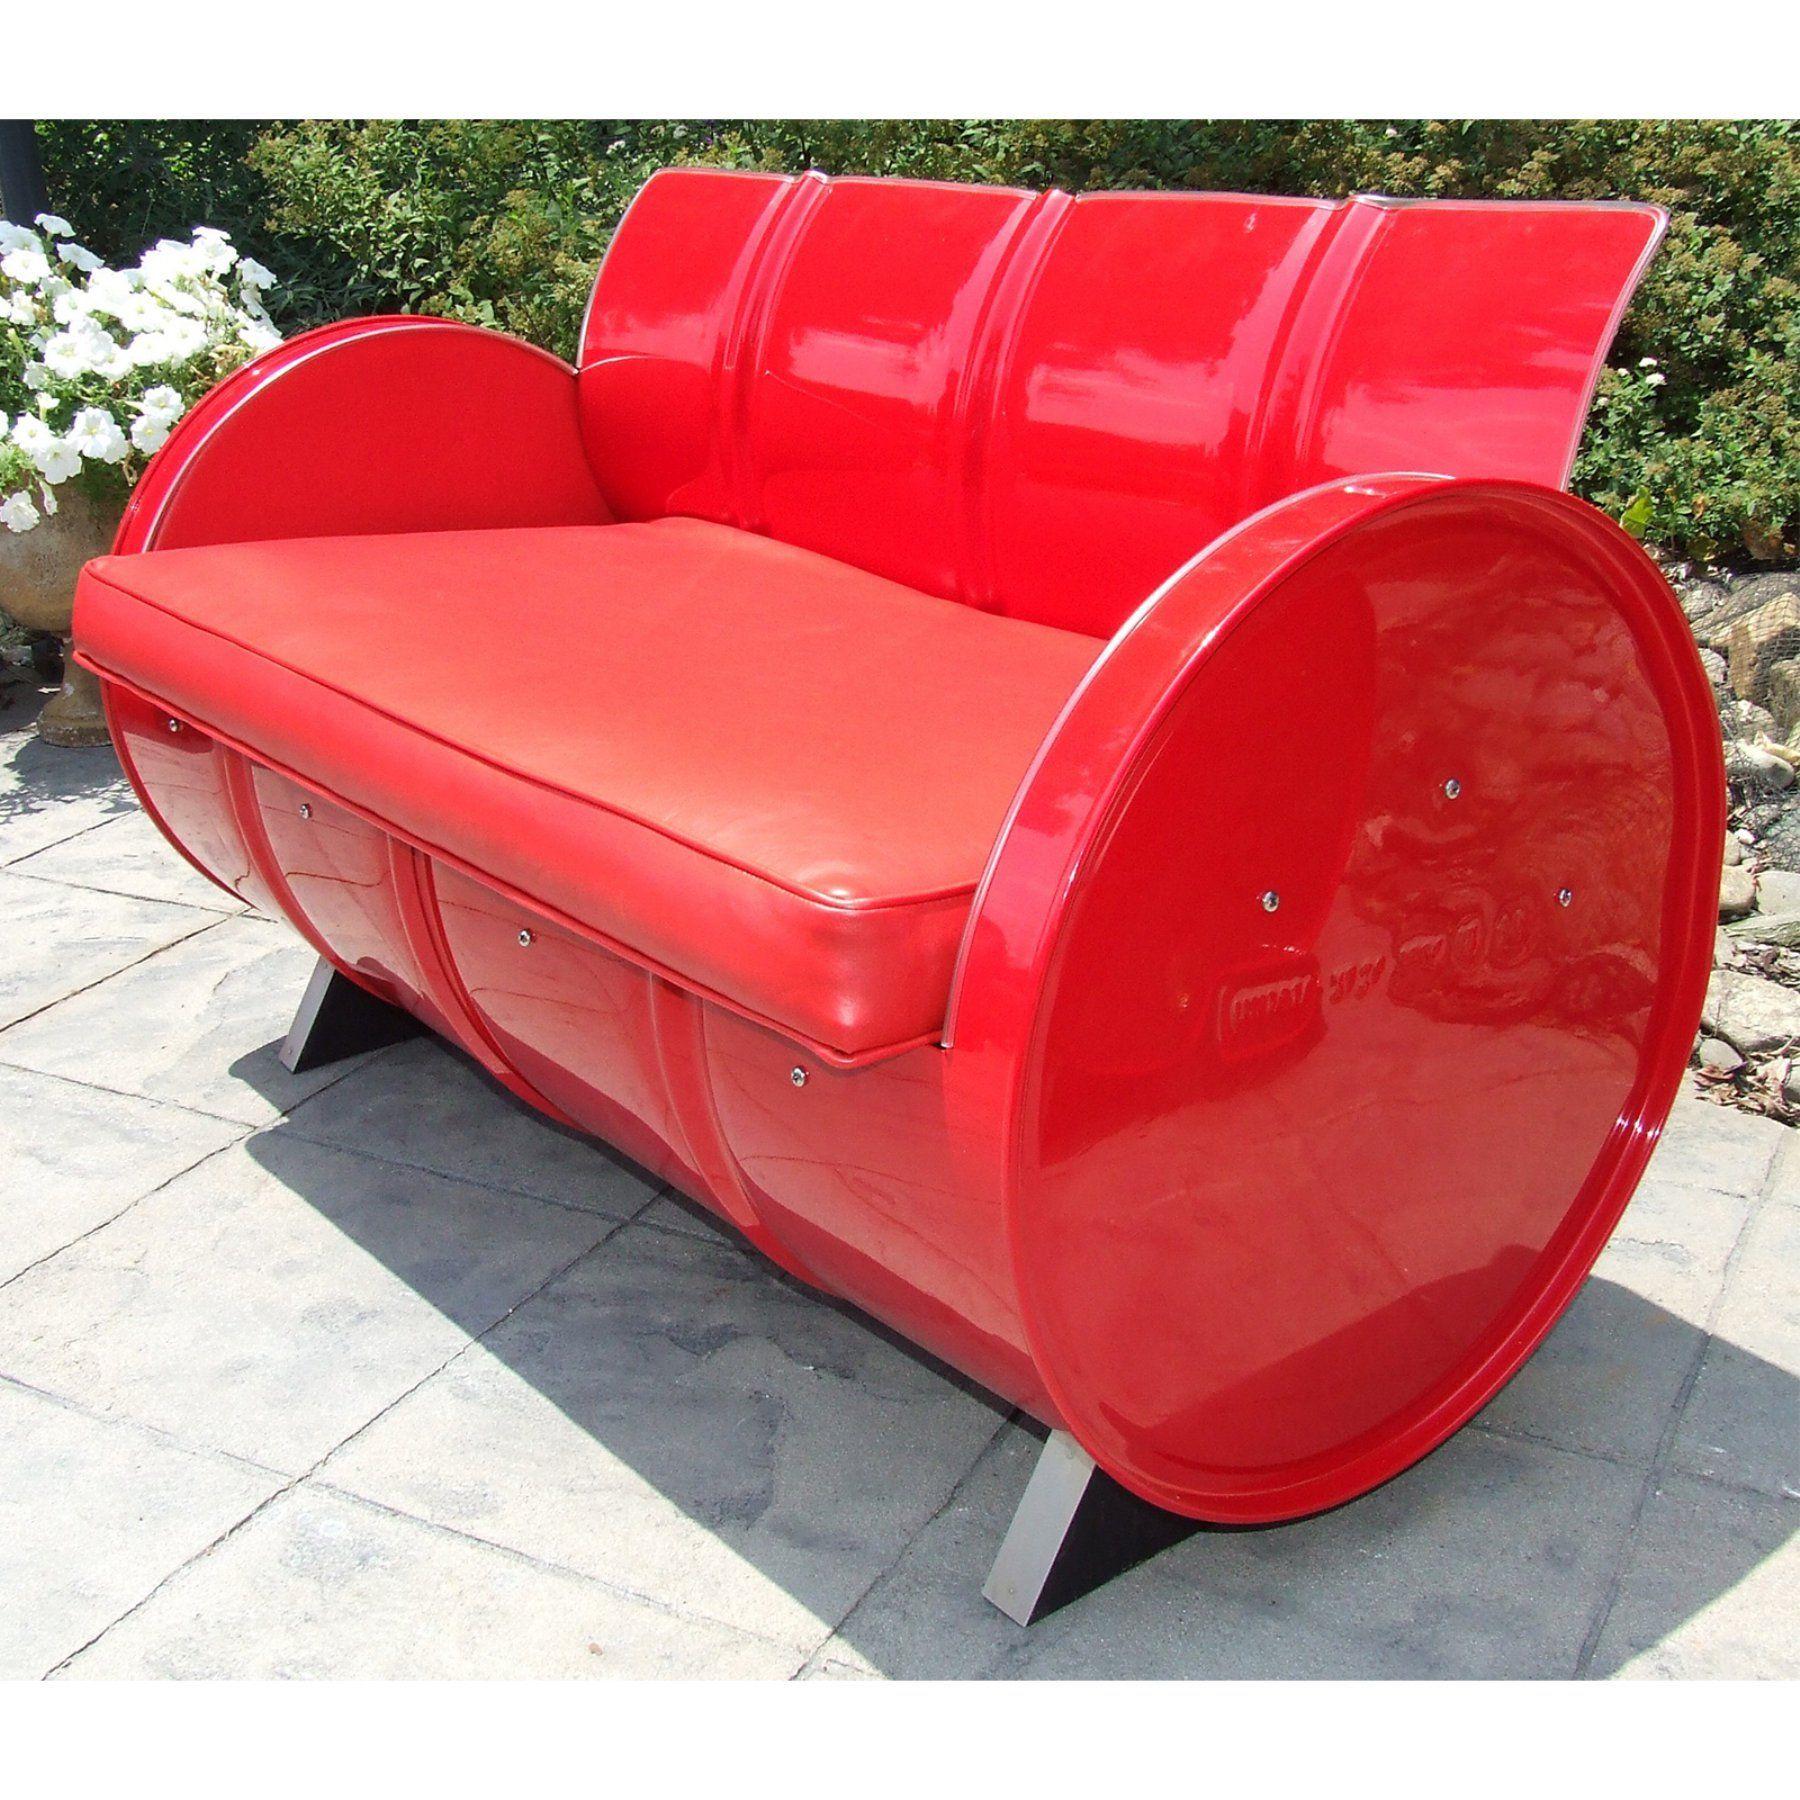 Outdoor Drum Works Furniture Very Red Loveseat - 5008